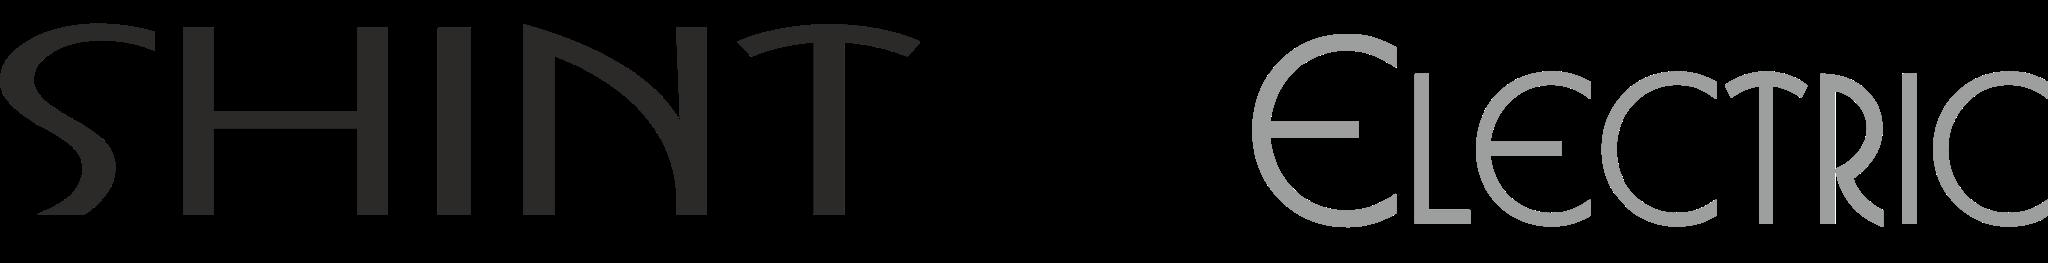 shintologoelectro